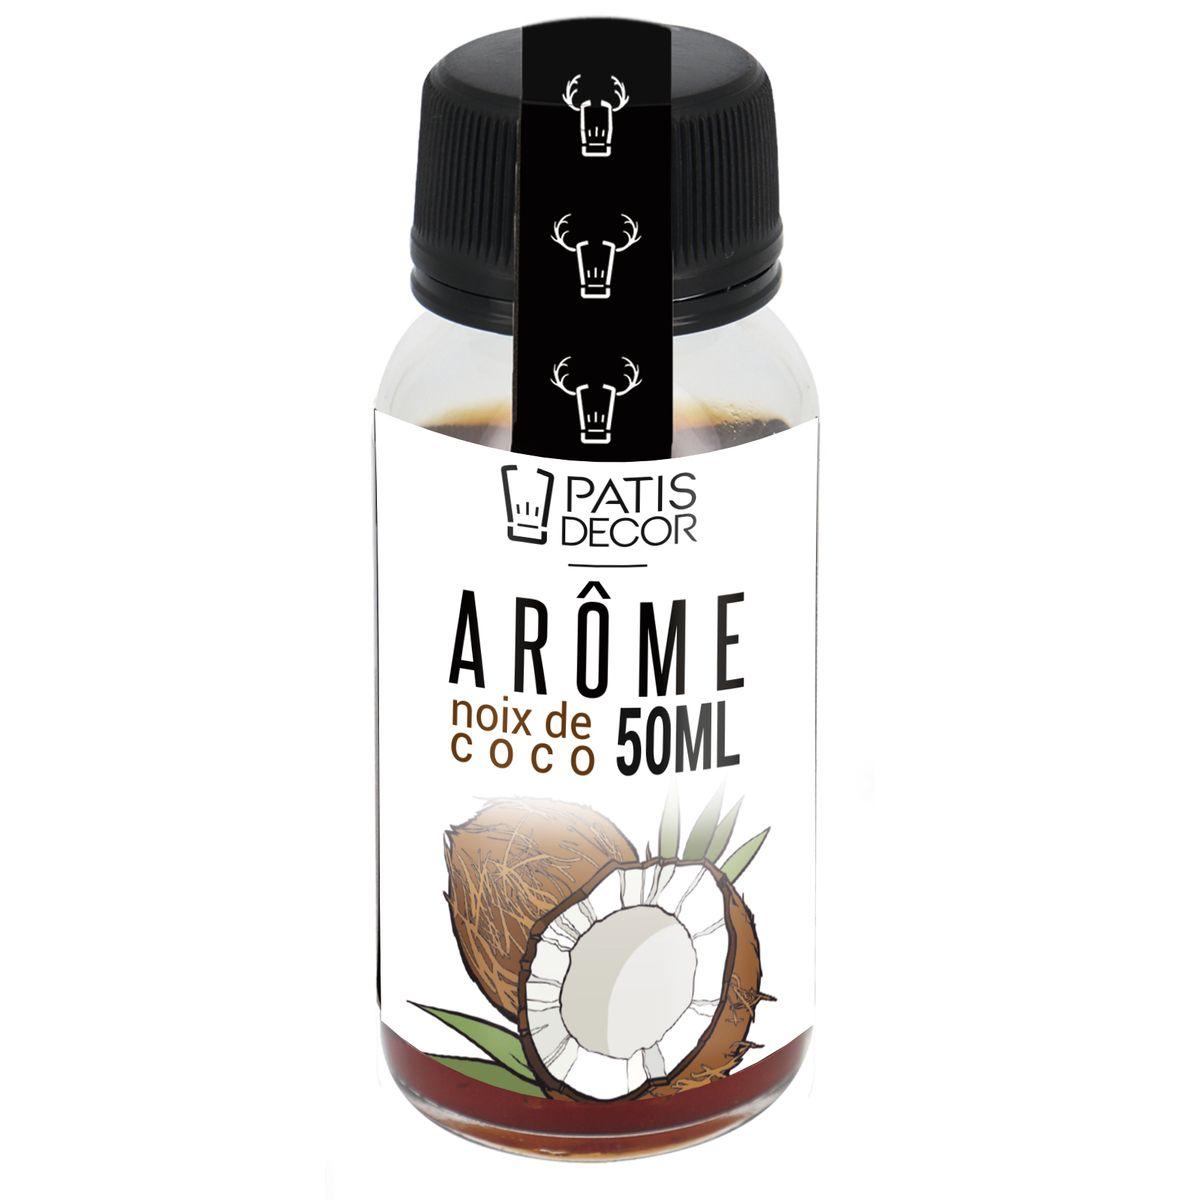 Arôme alimentaire naturel noix de coco 50 ml - Patisdecor